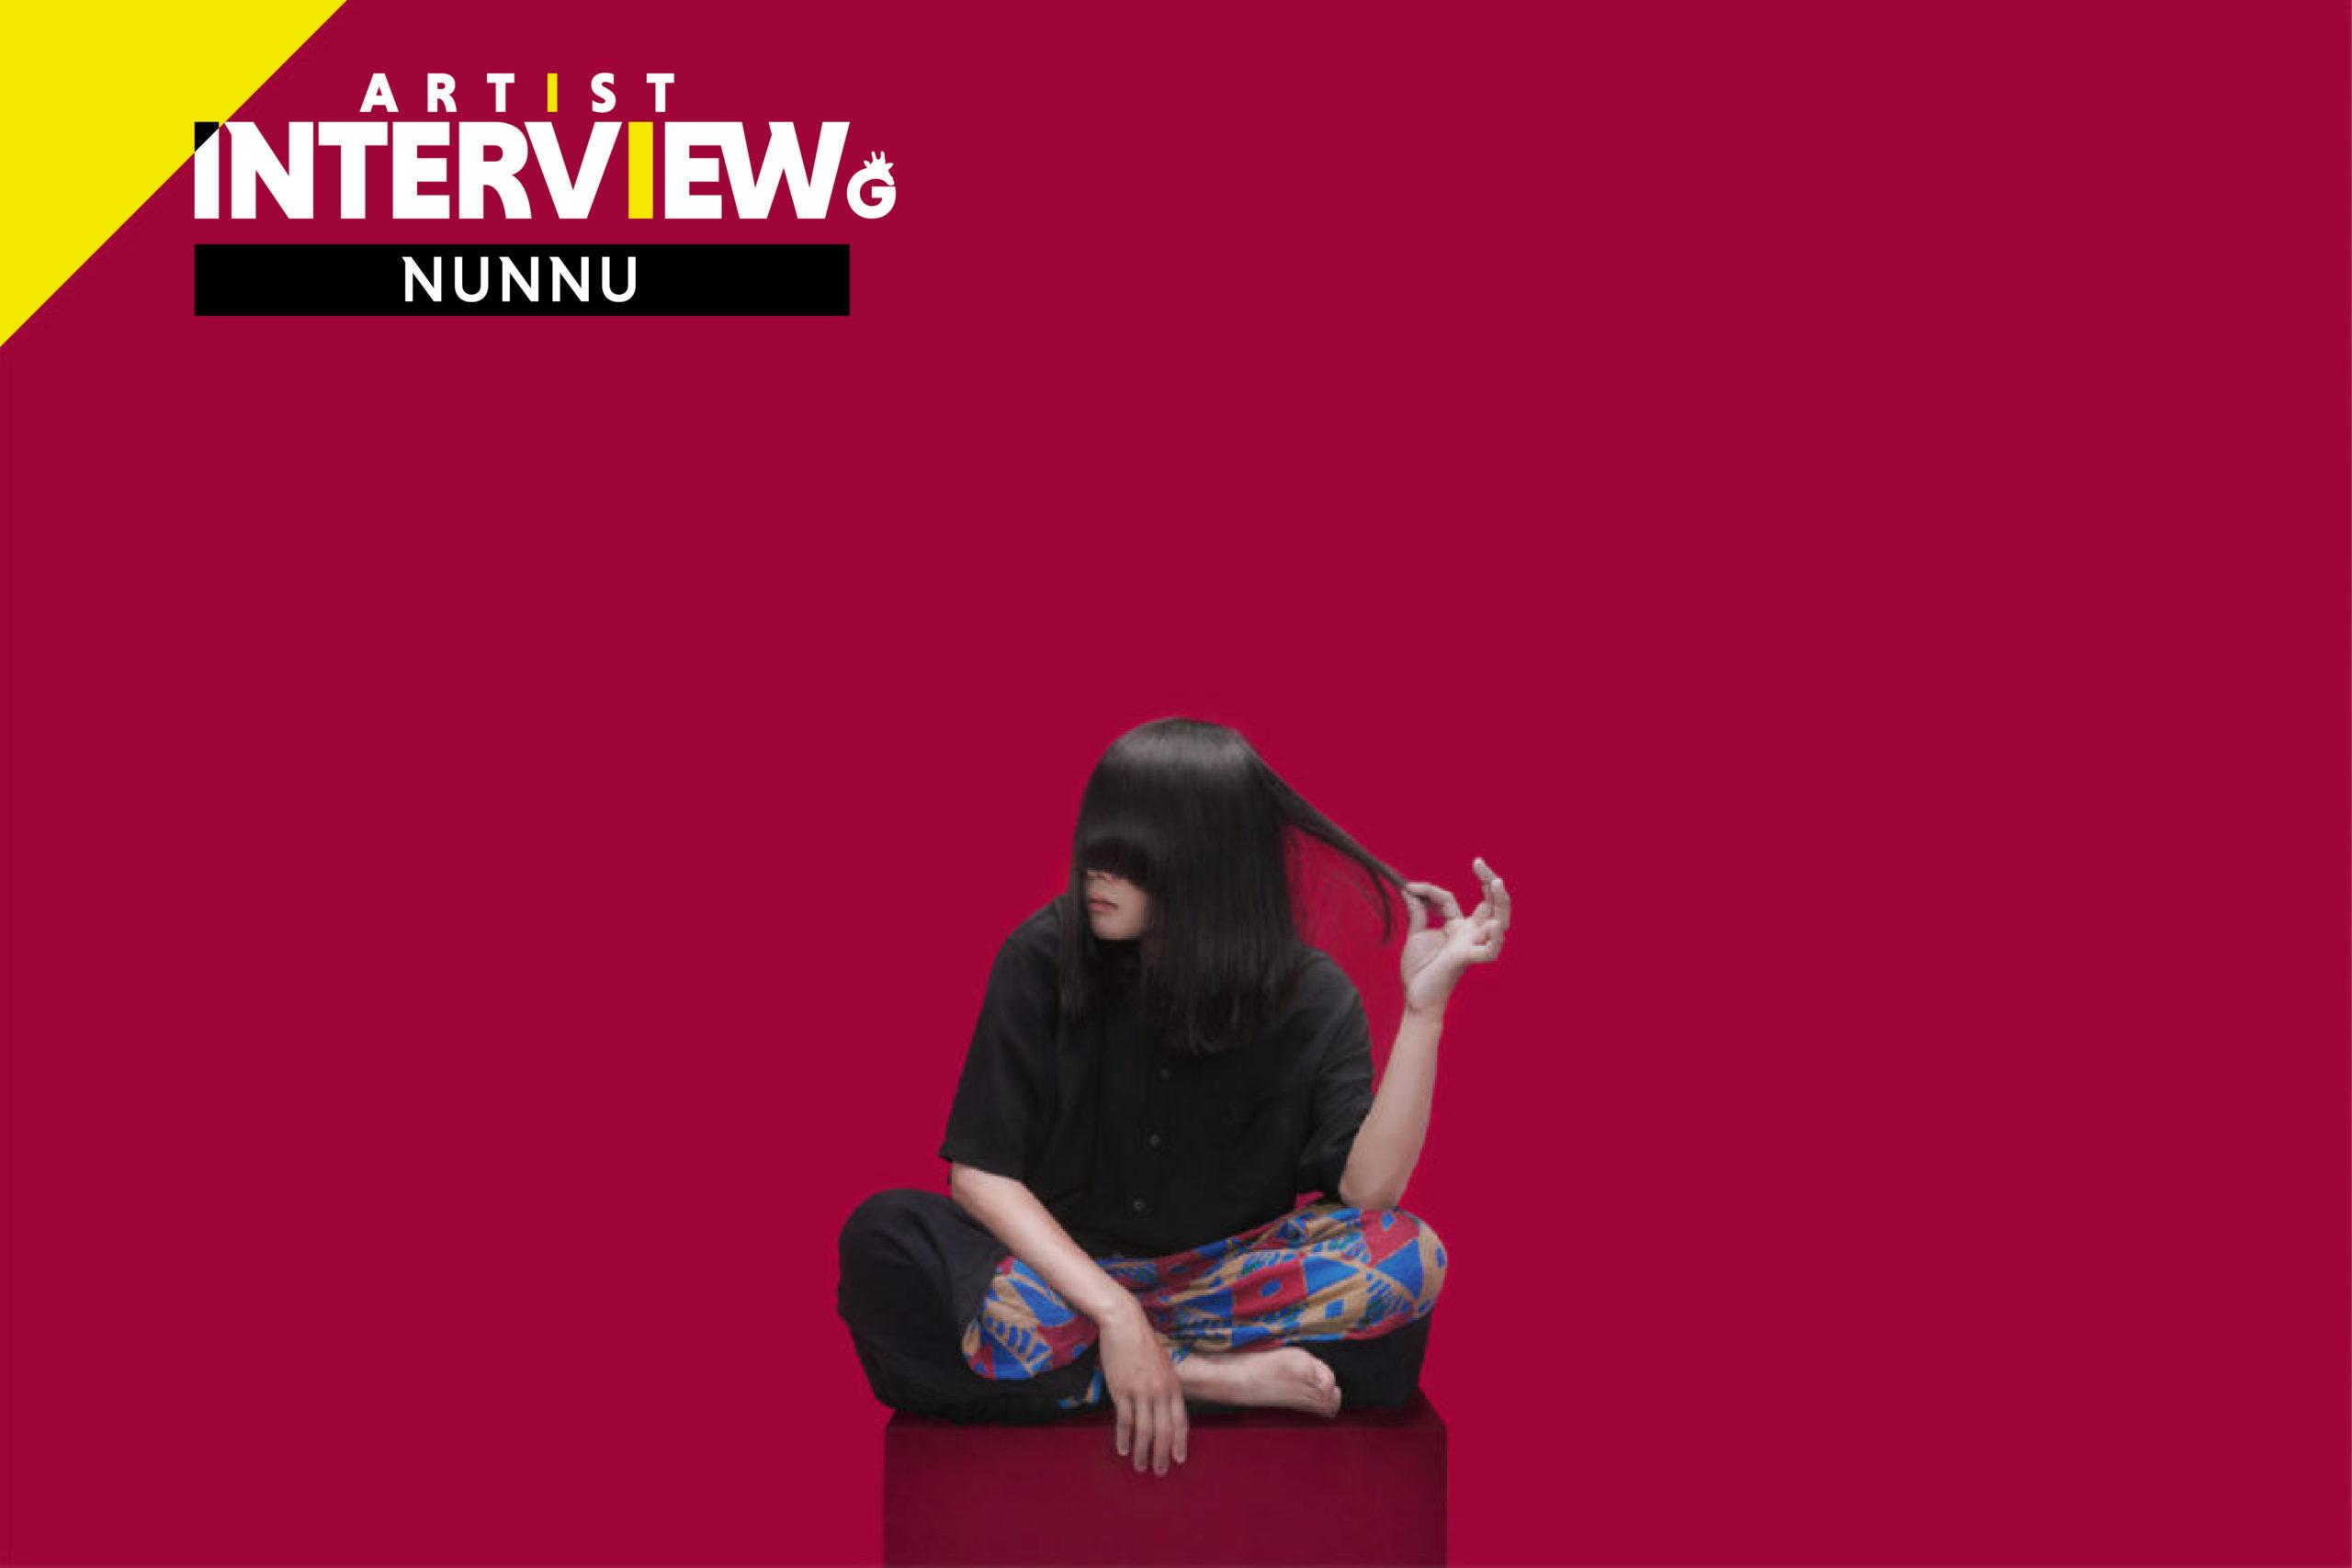 【NUNNU 独占ロングインタビュー】 普遍的なのに言葉にできない感情をすくい上げて歌う、NUNNUの音楽について